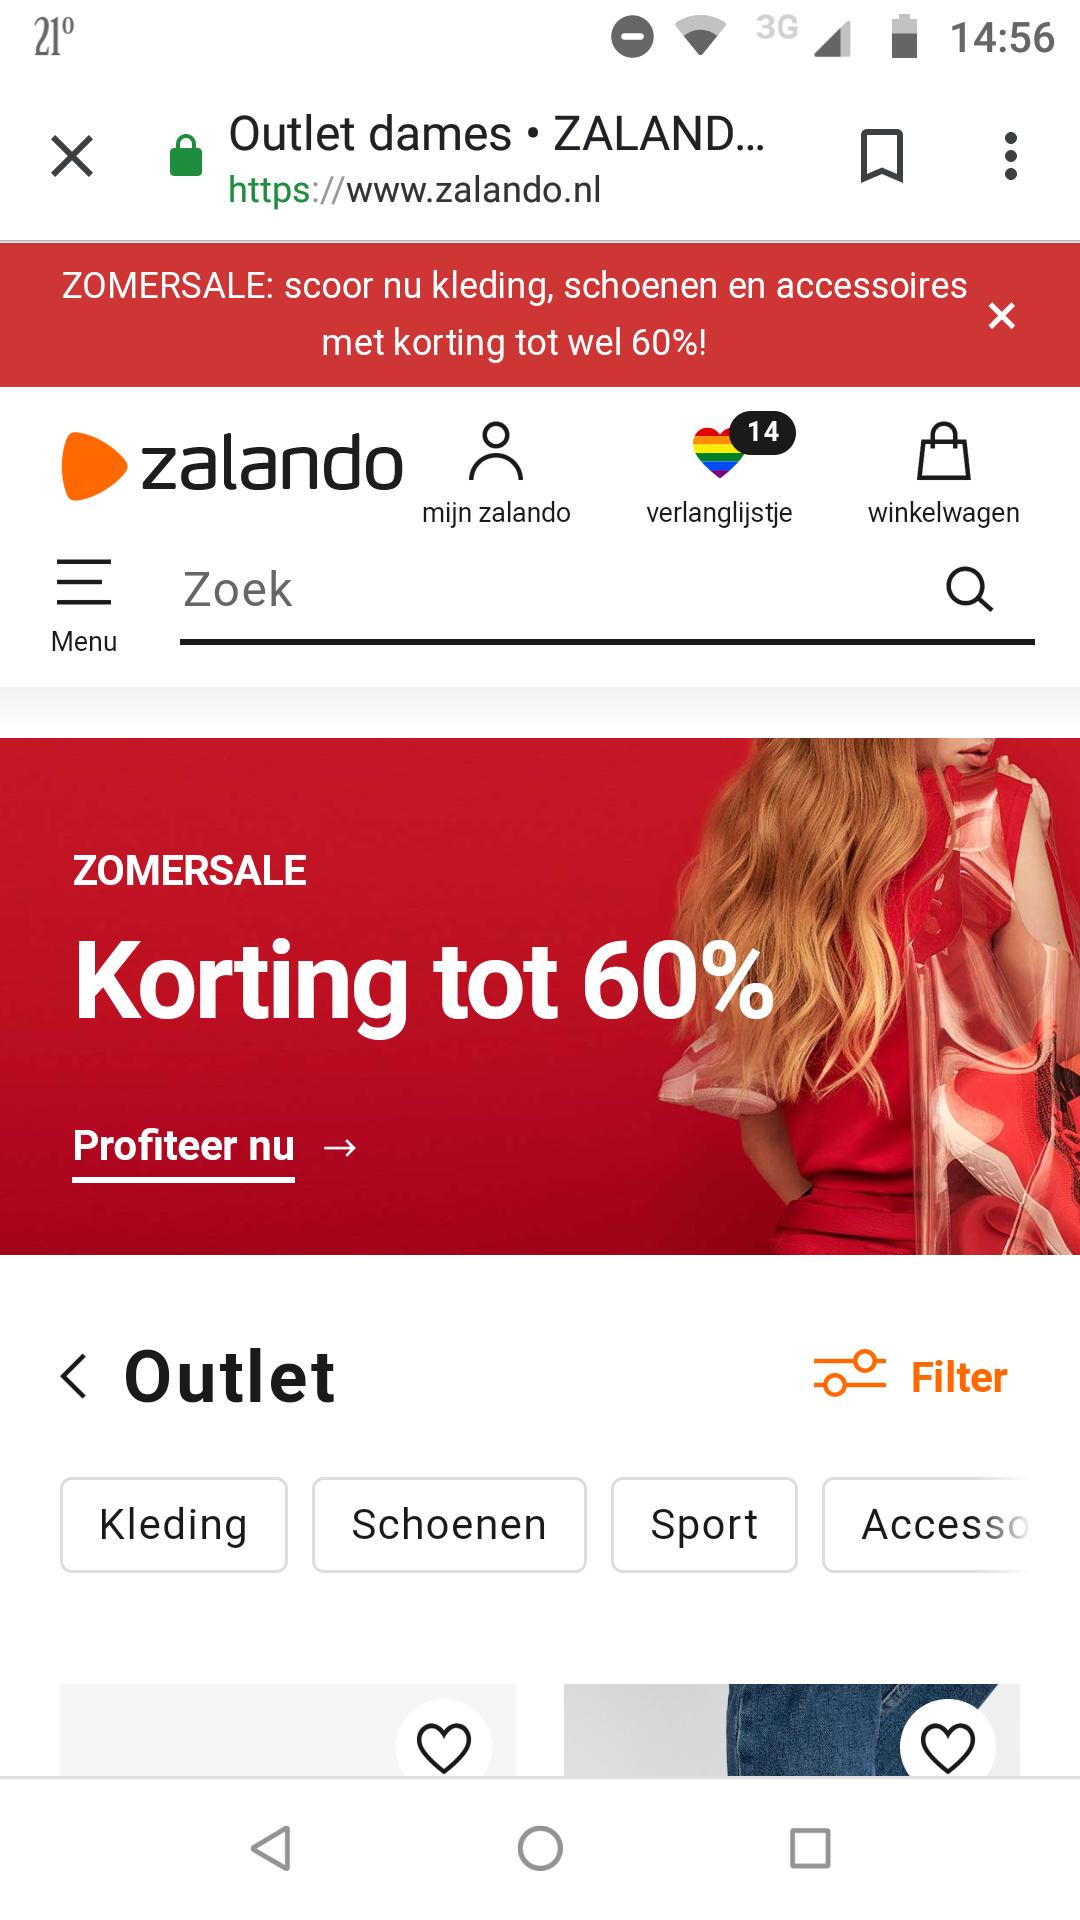 Zalando Zomersale - korting tot 60%